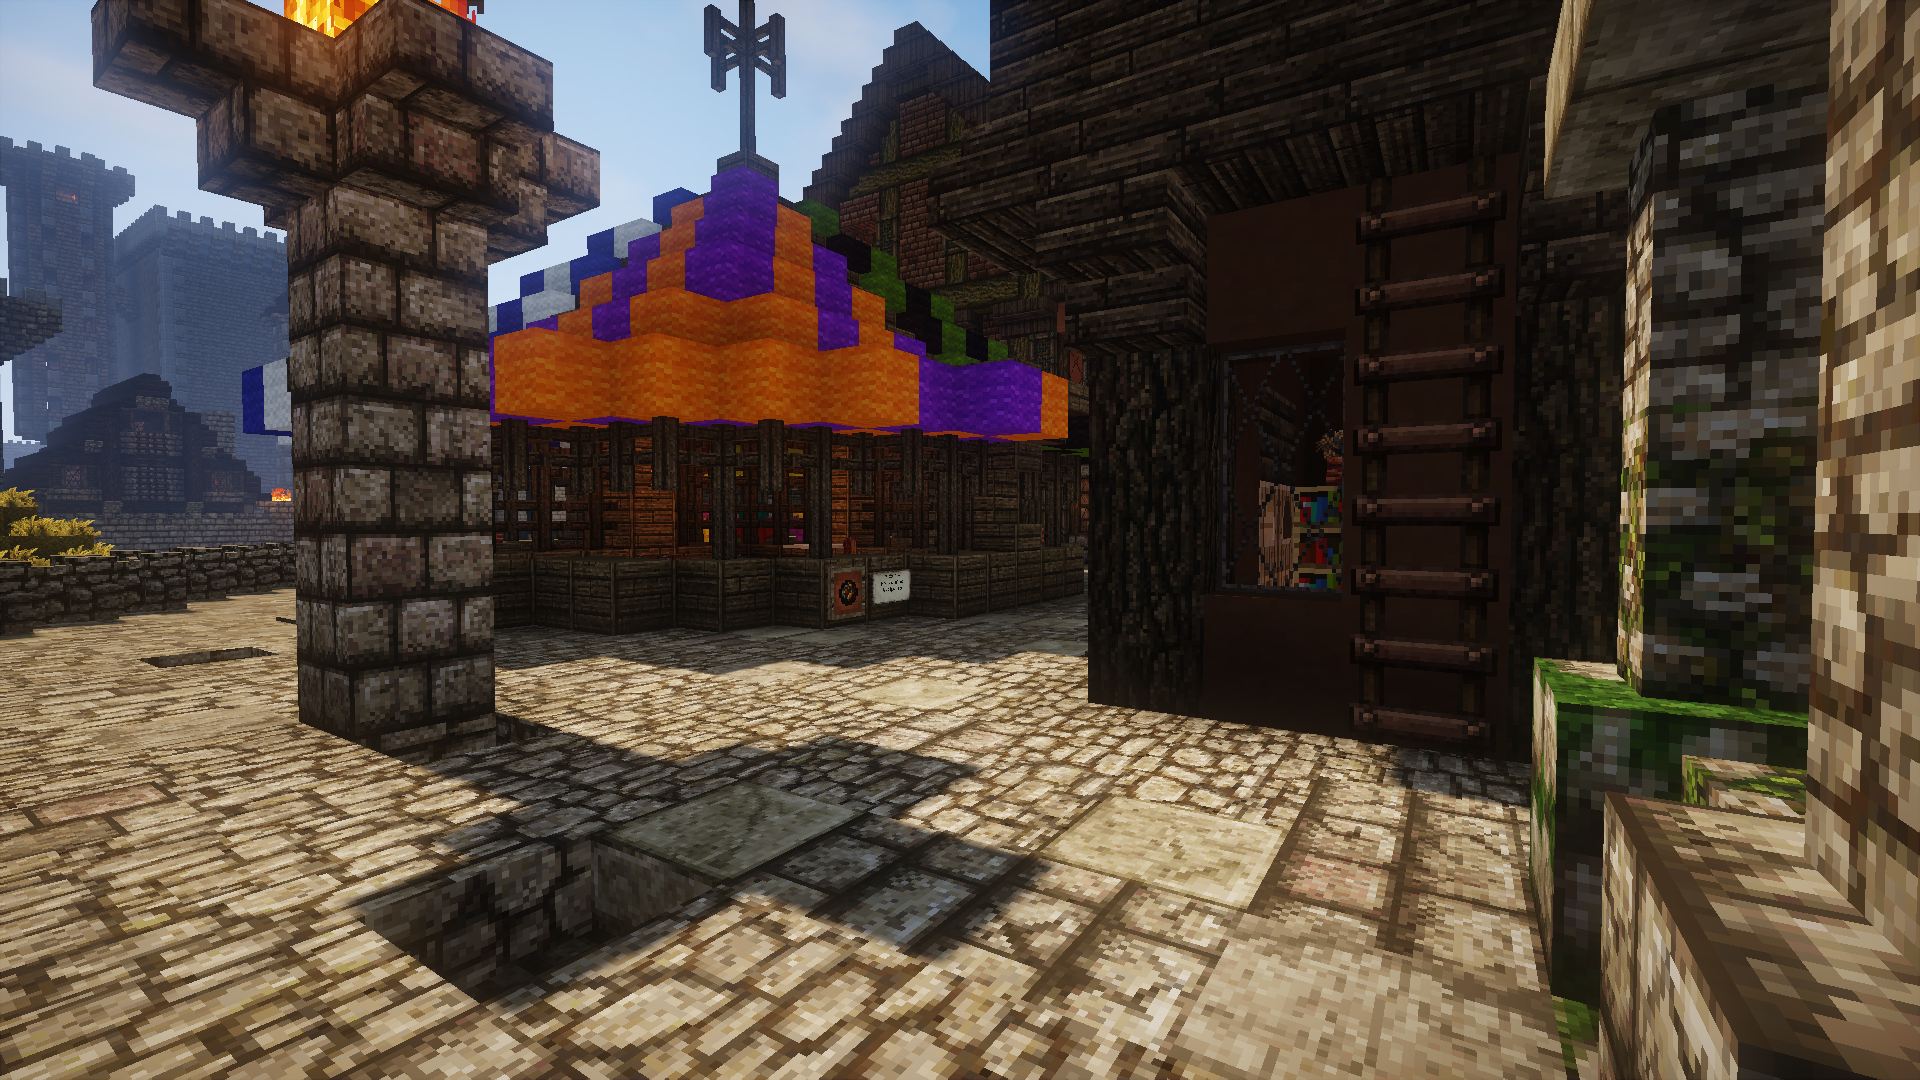 Seven Hills -World of Midgard скриншот 2